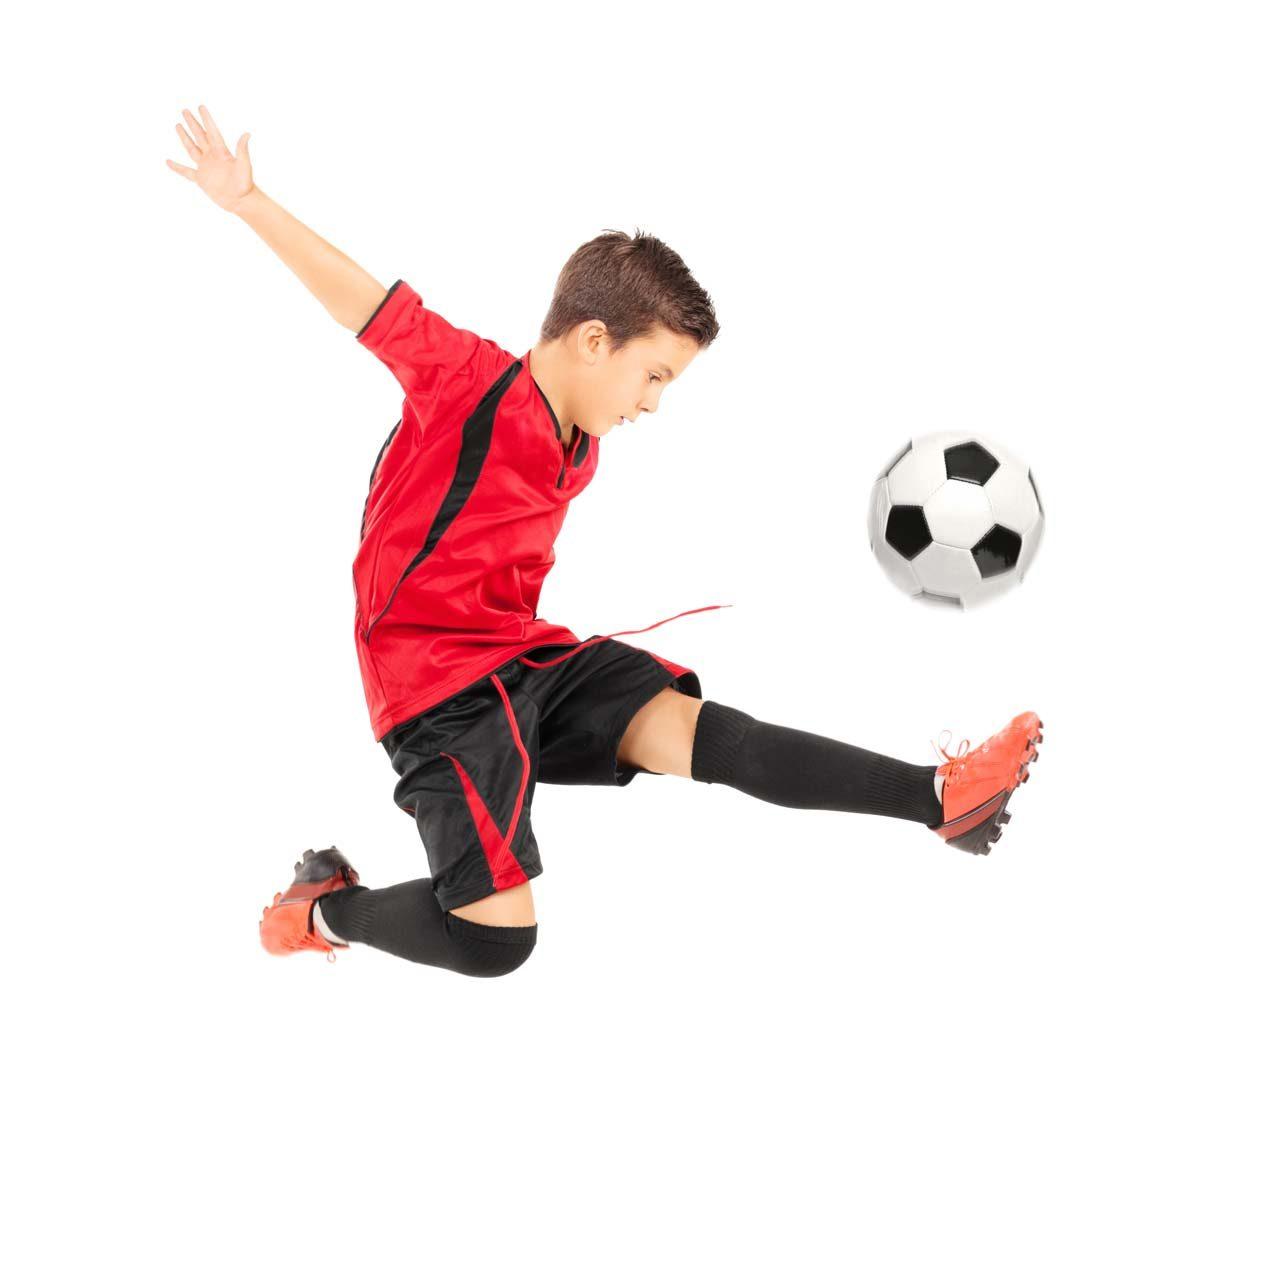 Match-fit-ireland-youth-athletes-training-monitoring-sports